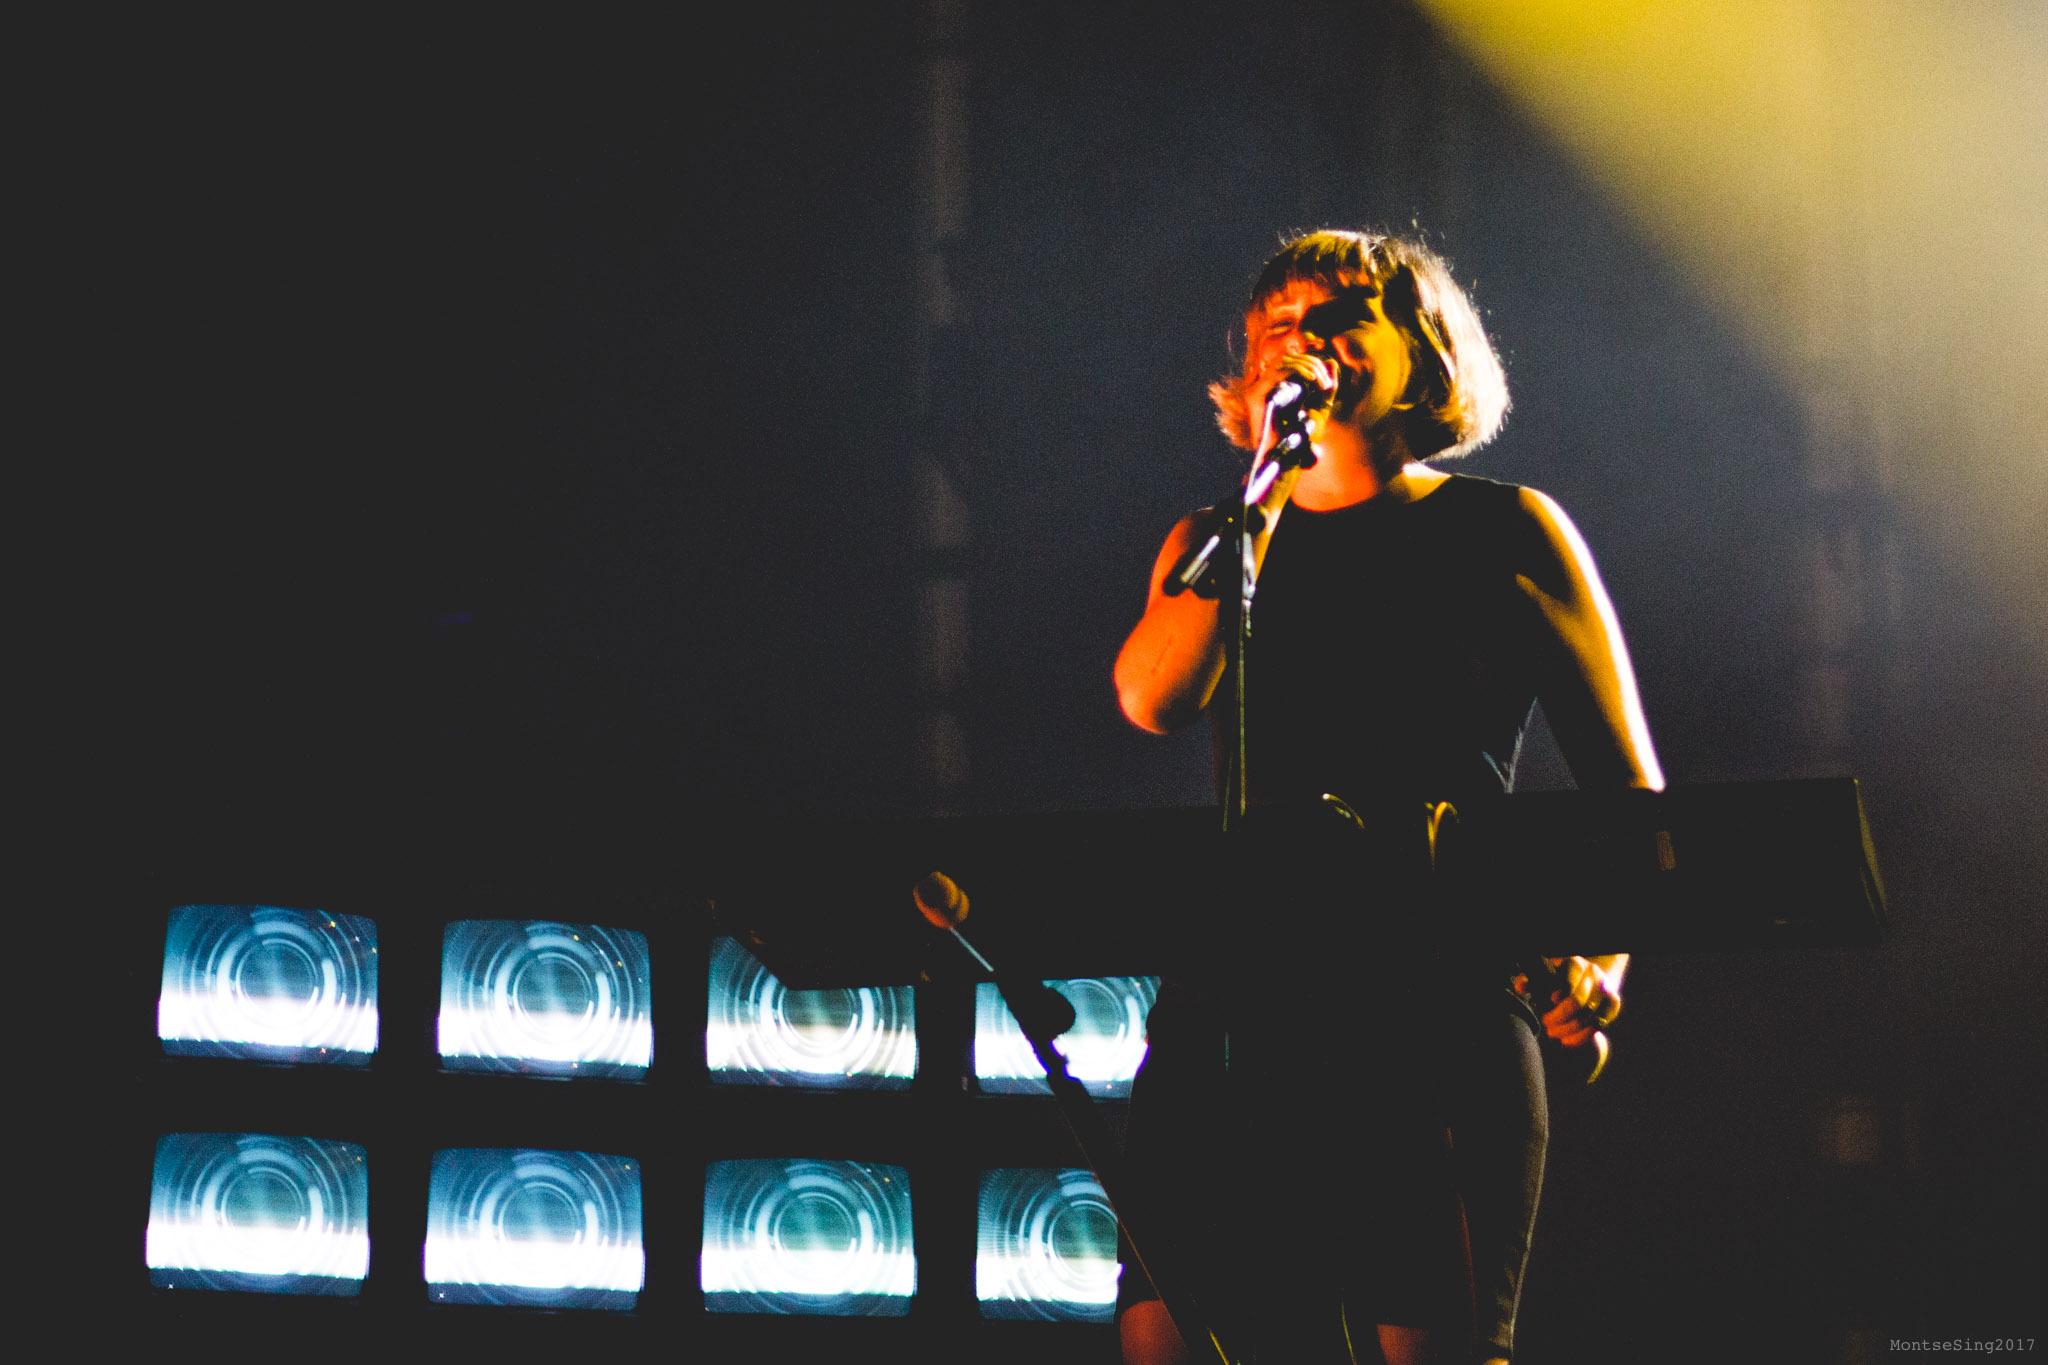 Cris, vocalista de Belako en el Santander Music | Foto: Montse Sing